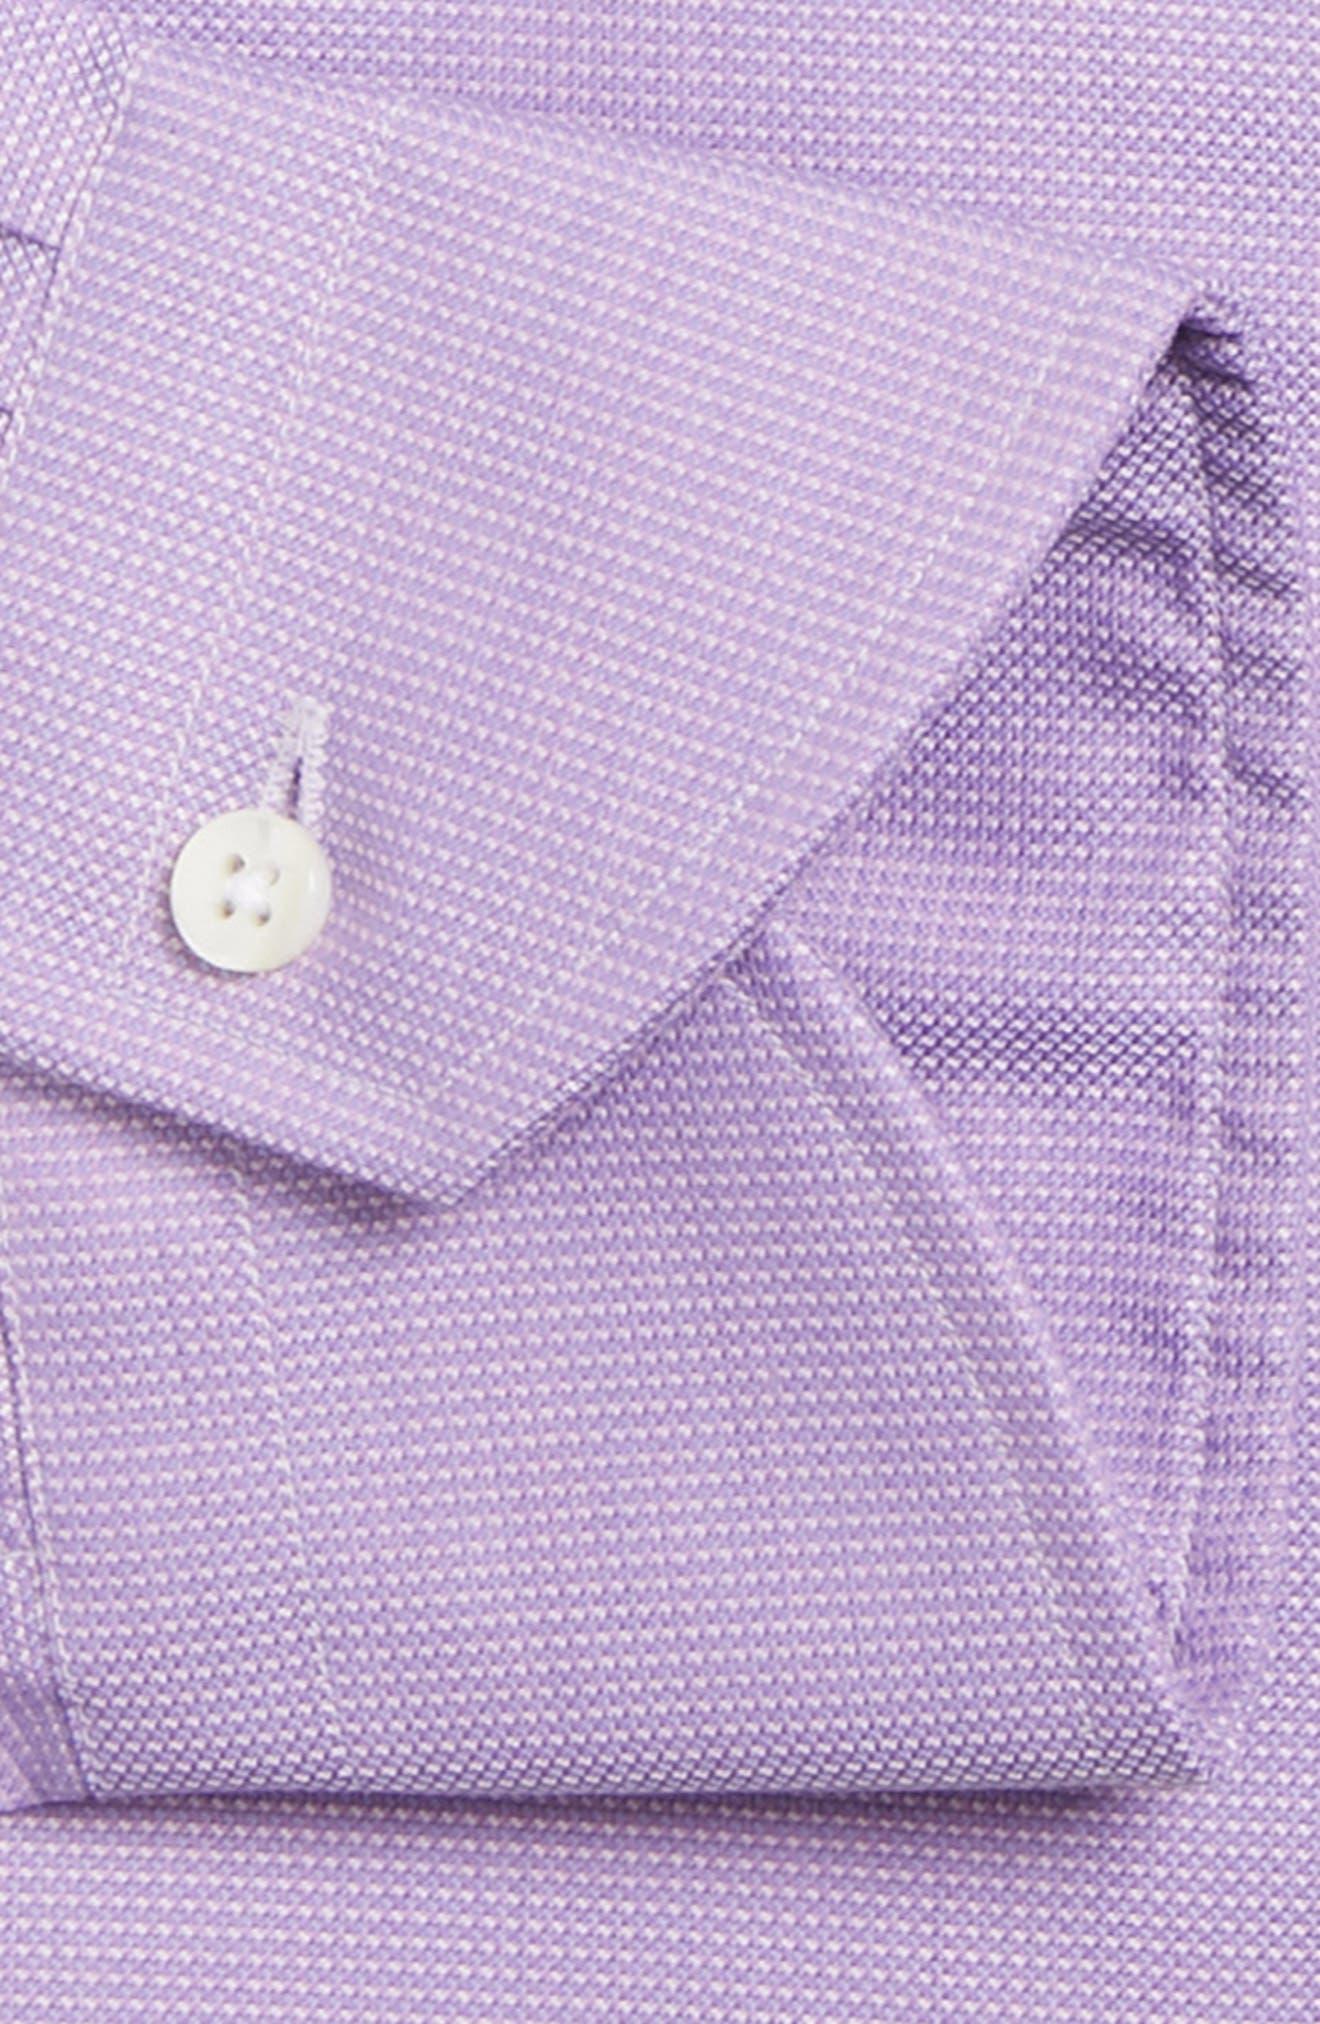 Regular Fit Solid Dress Shirt,                             Alternate thumbnail 6, color,                             520